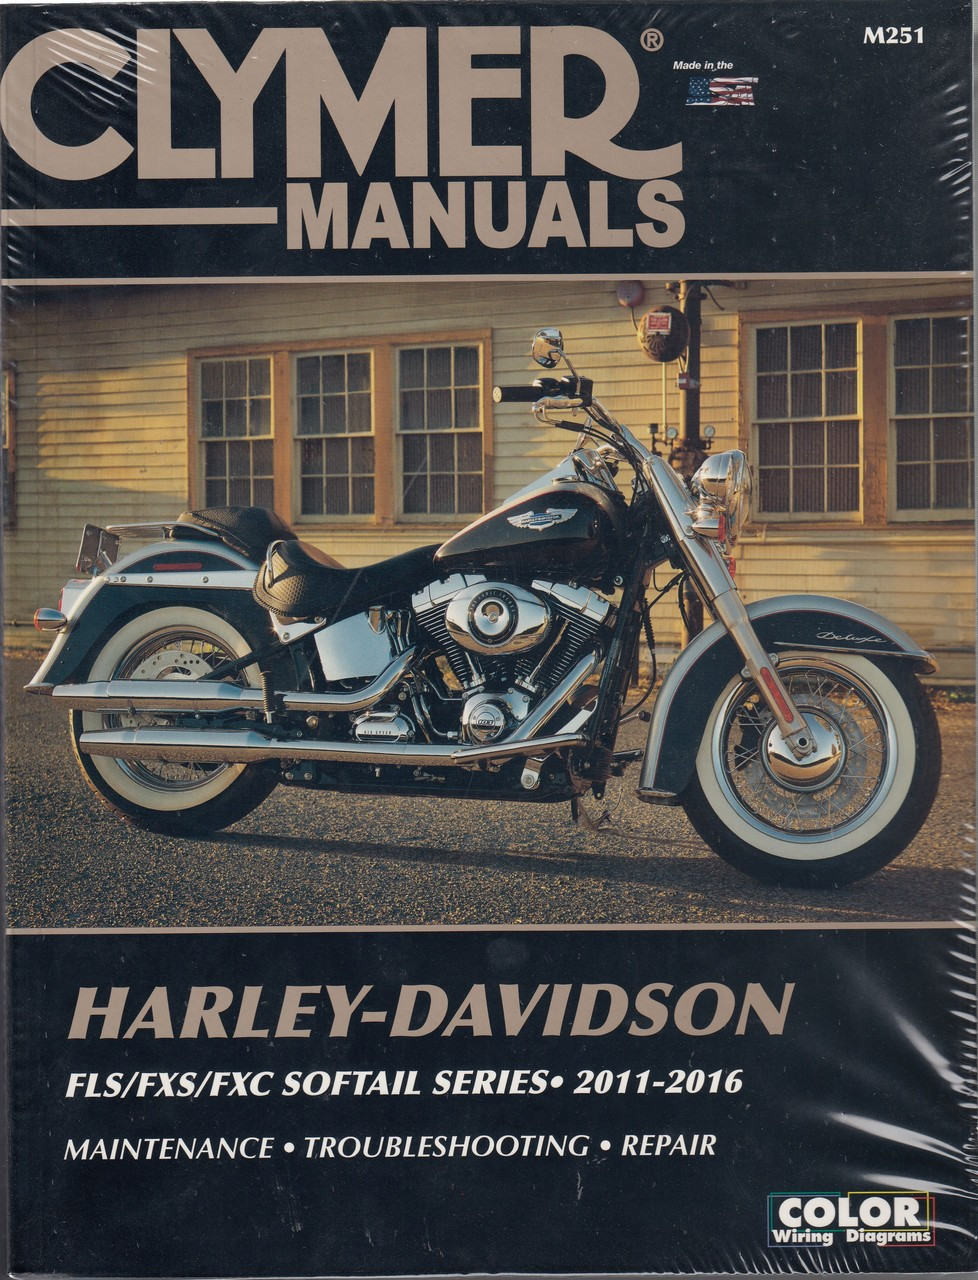 Clymer's Harley Davidson Workshop Manual FLS / FXS / FXC Softail Series on